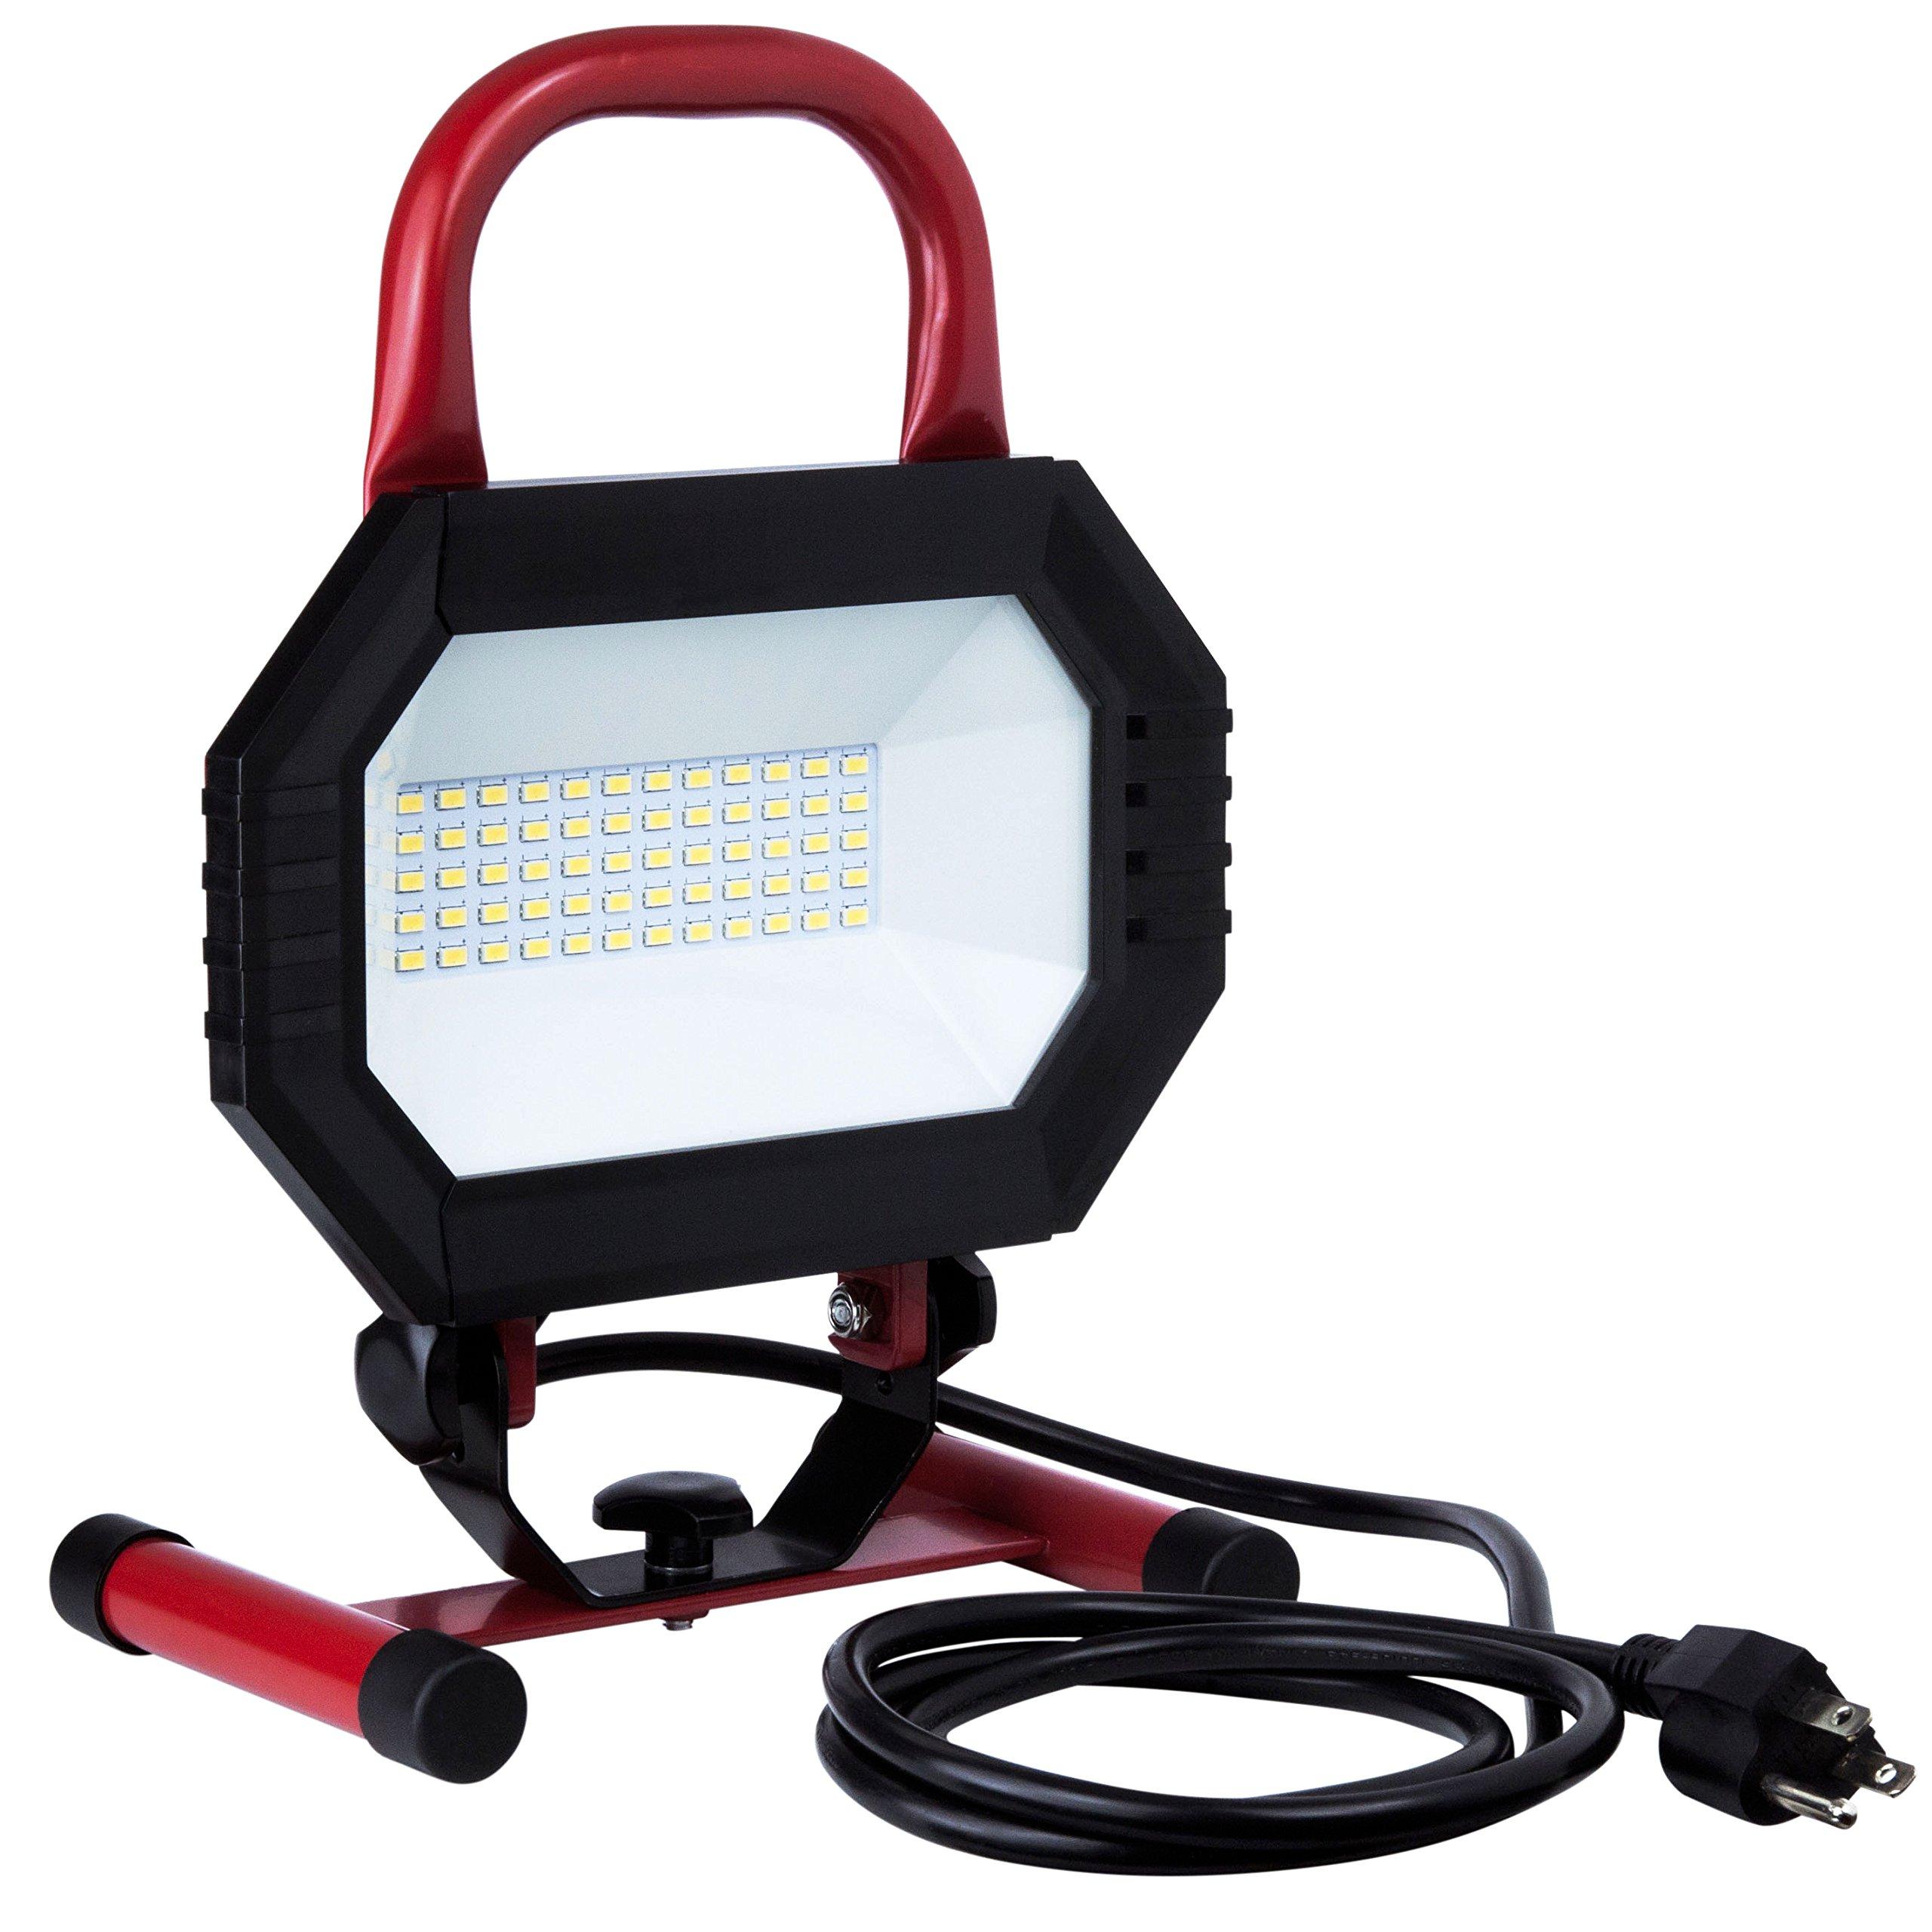 Sunlite LFX/WL/30W/W 04364 30W 120V Portable LED Work Light Fixture, Black/Red Finish